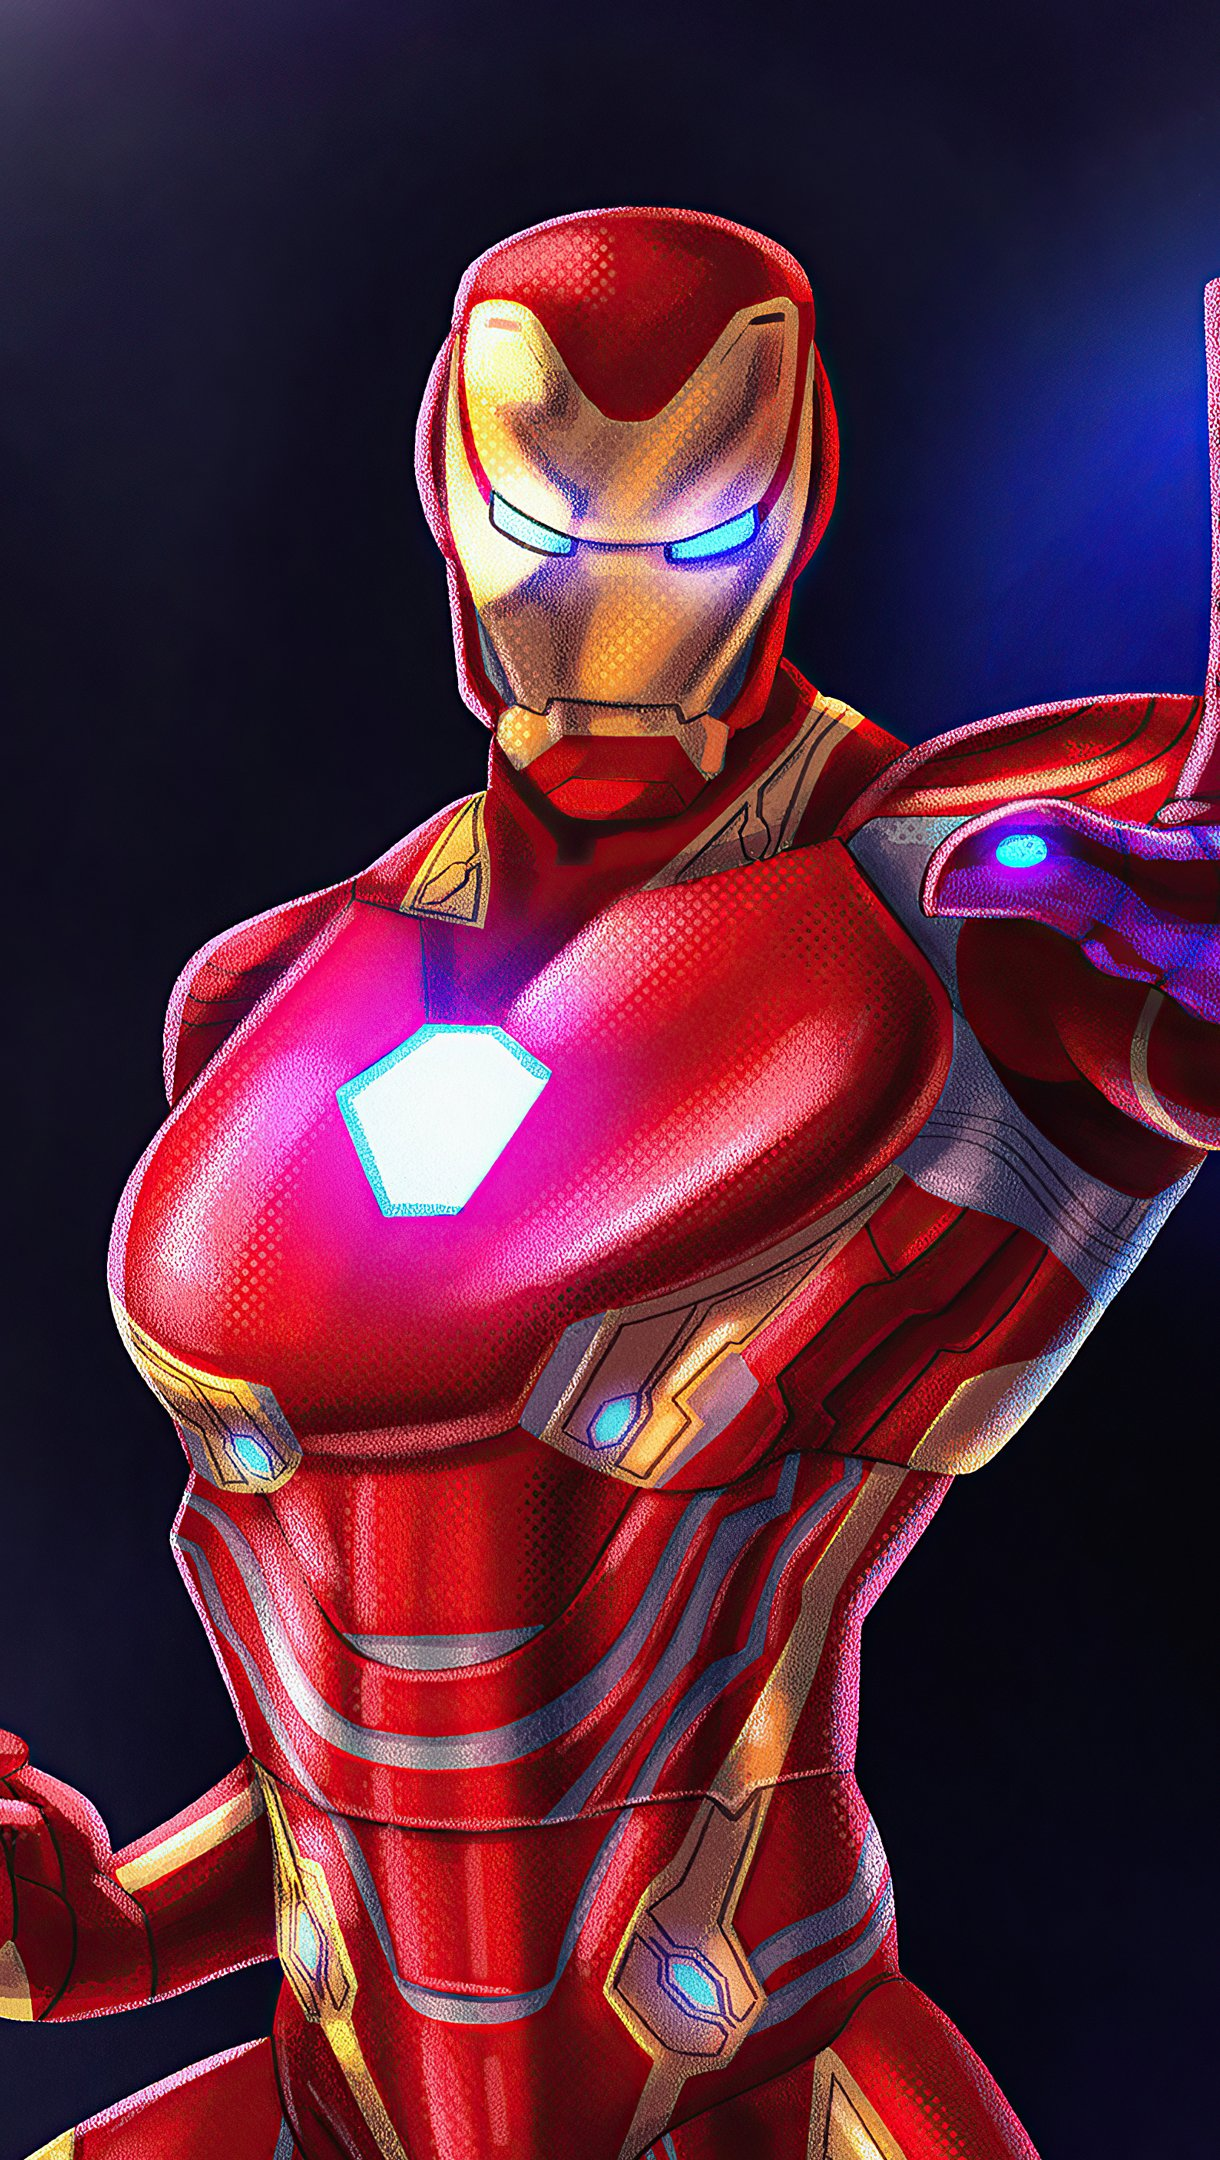 Fondos de pantalla Iron Man Fanart 2020 Vertical